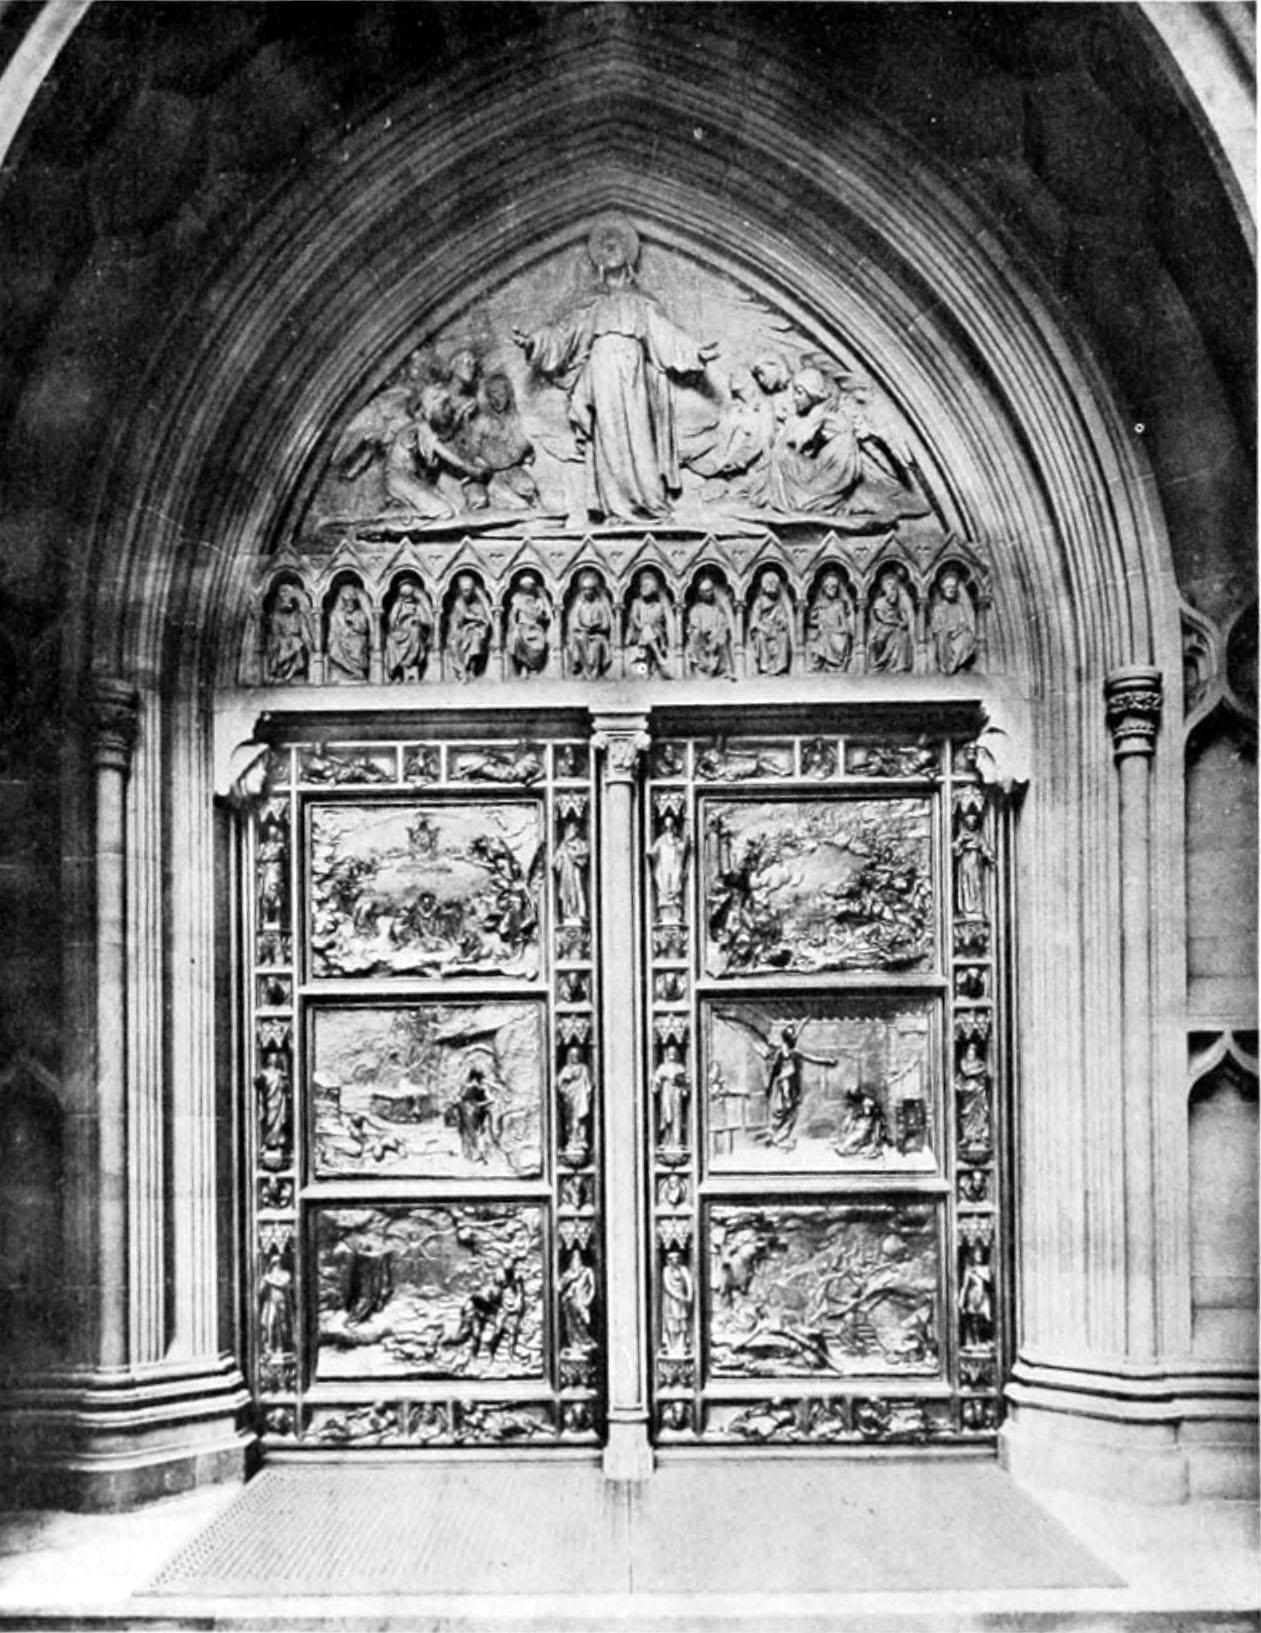 FileSchevill Karl Bitter Trinity Gate.jpg & File:Schevill Karl Bitter Trinity Gate.jpg - Wikimedia Commons